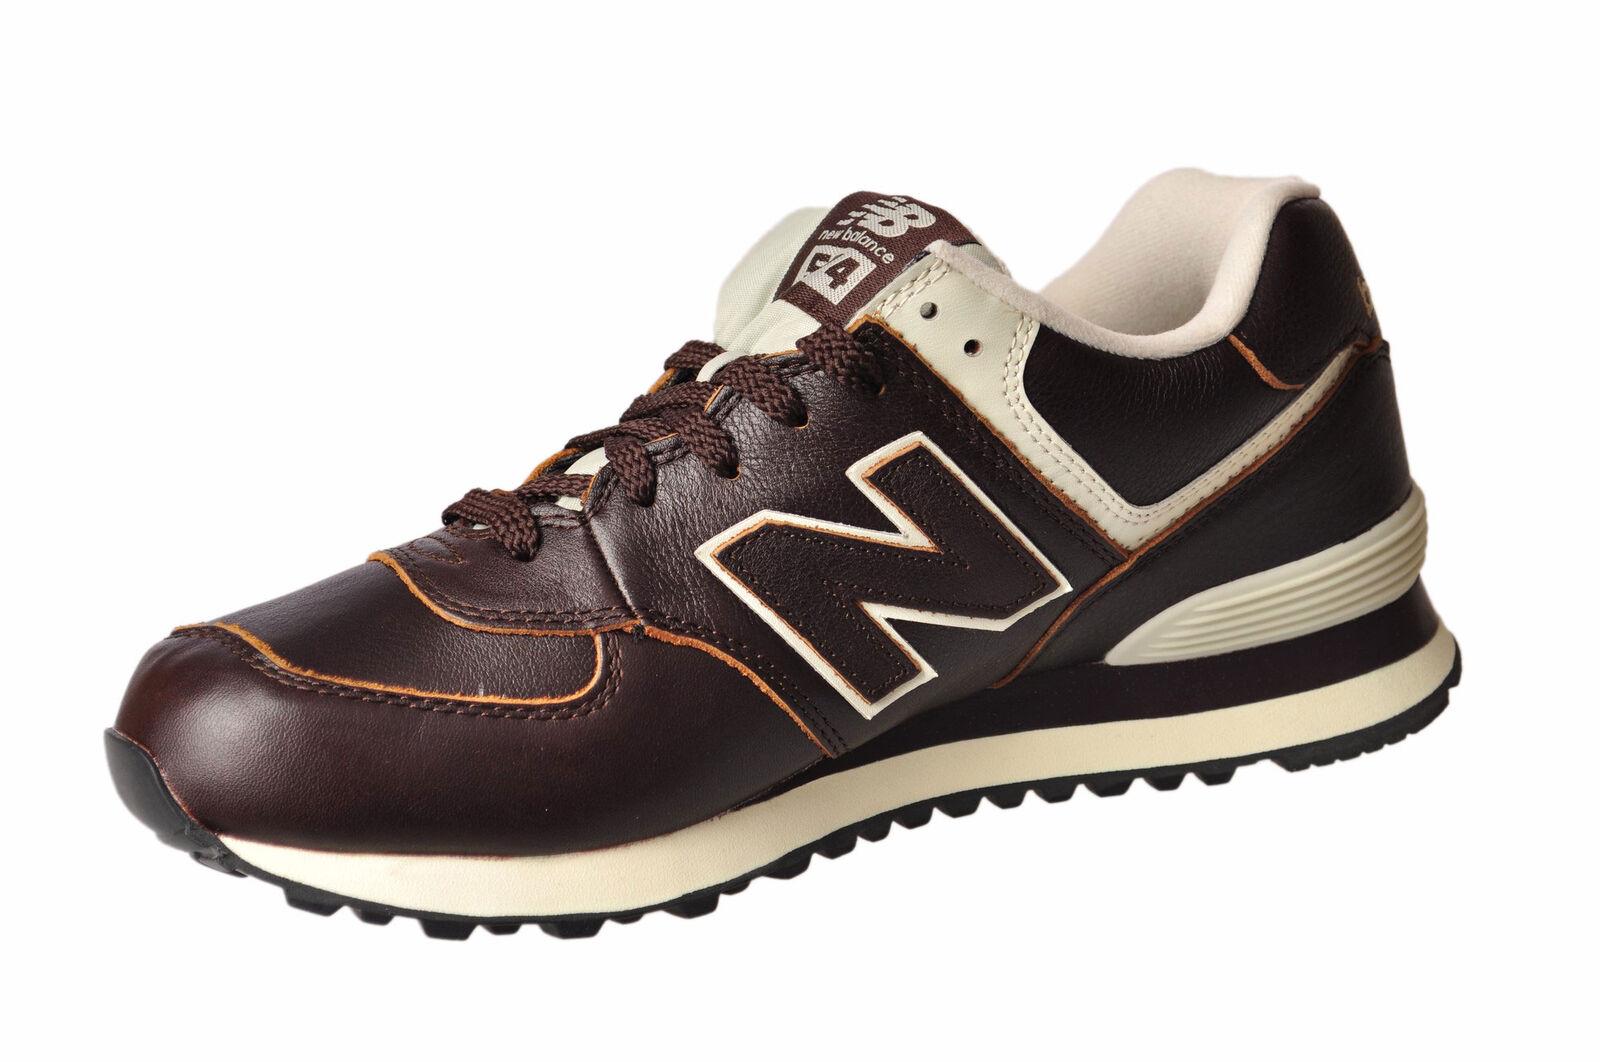 Scarpe casual da uomo  New Balance  -  Sneakers - Male - Brown - 2577527N173645